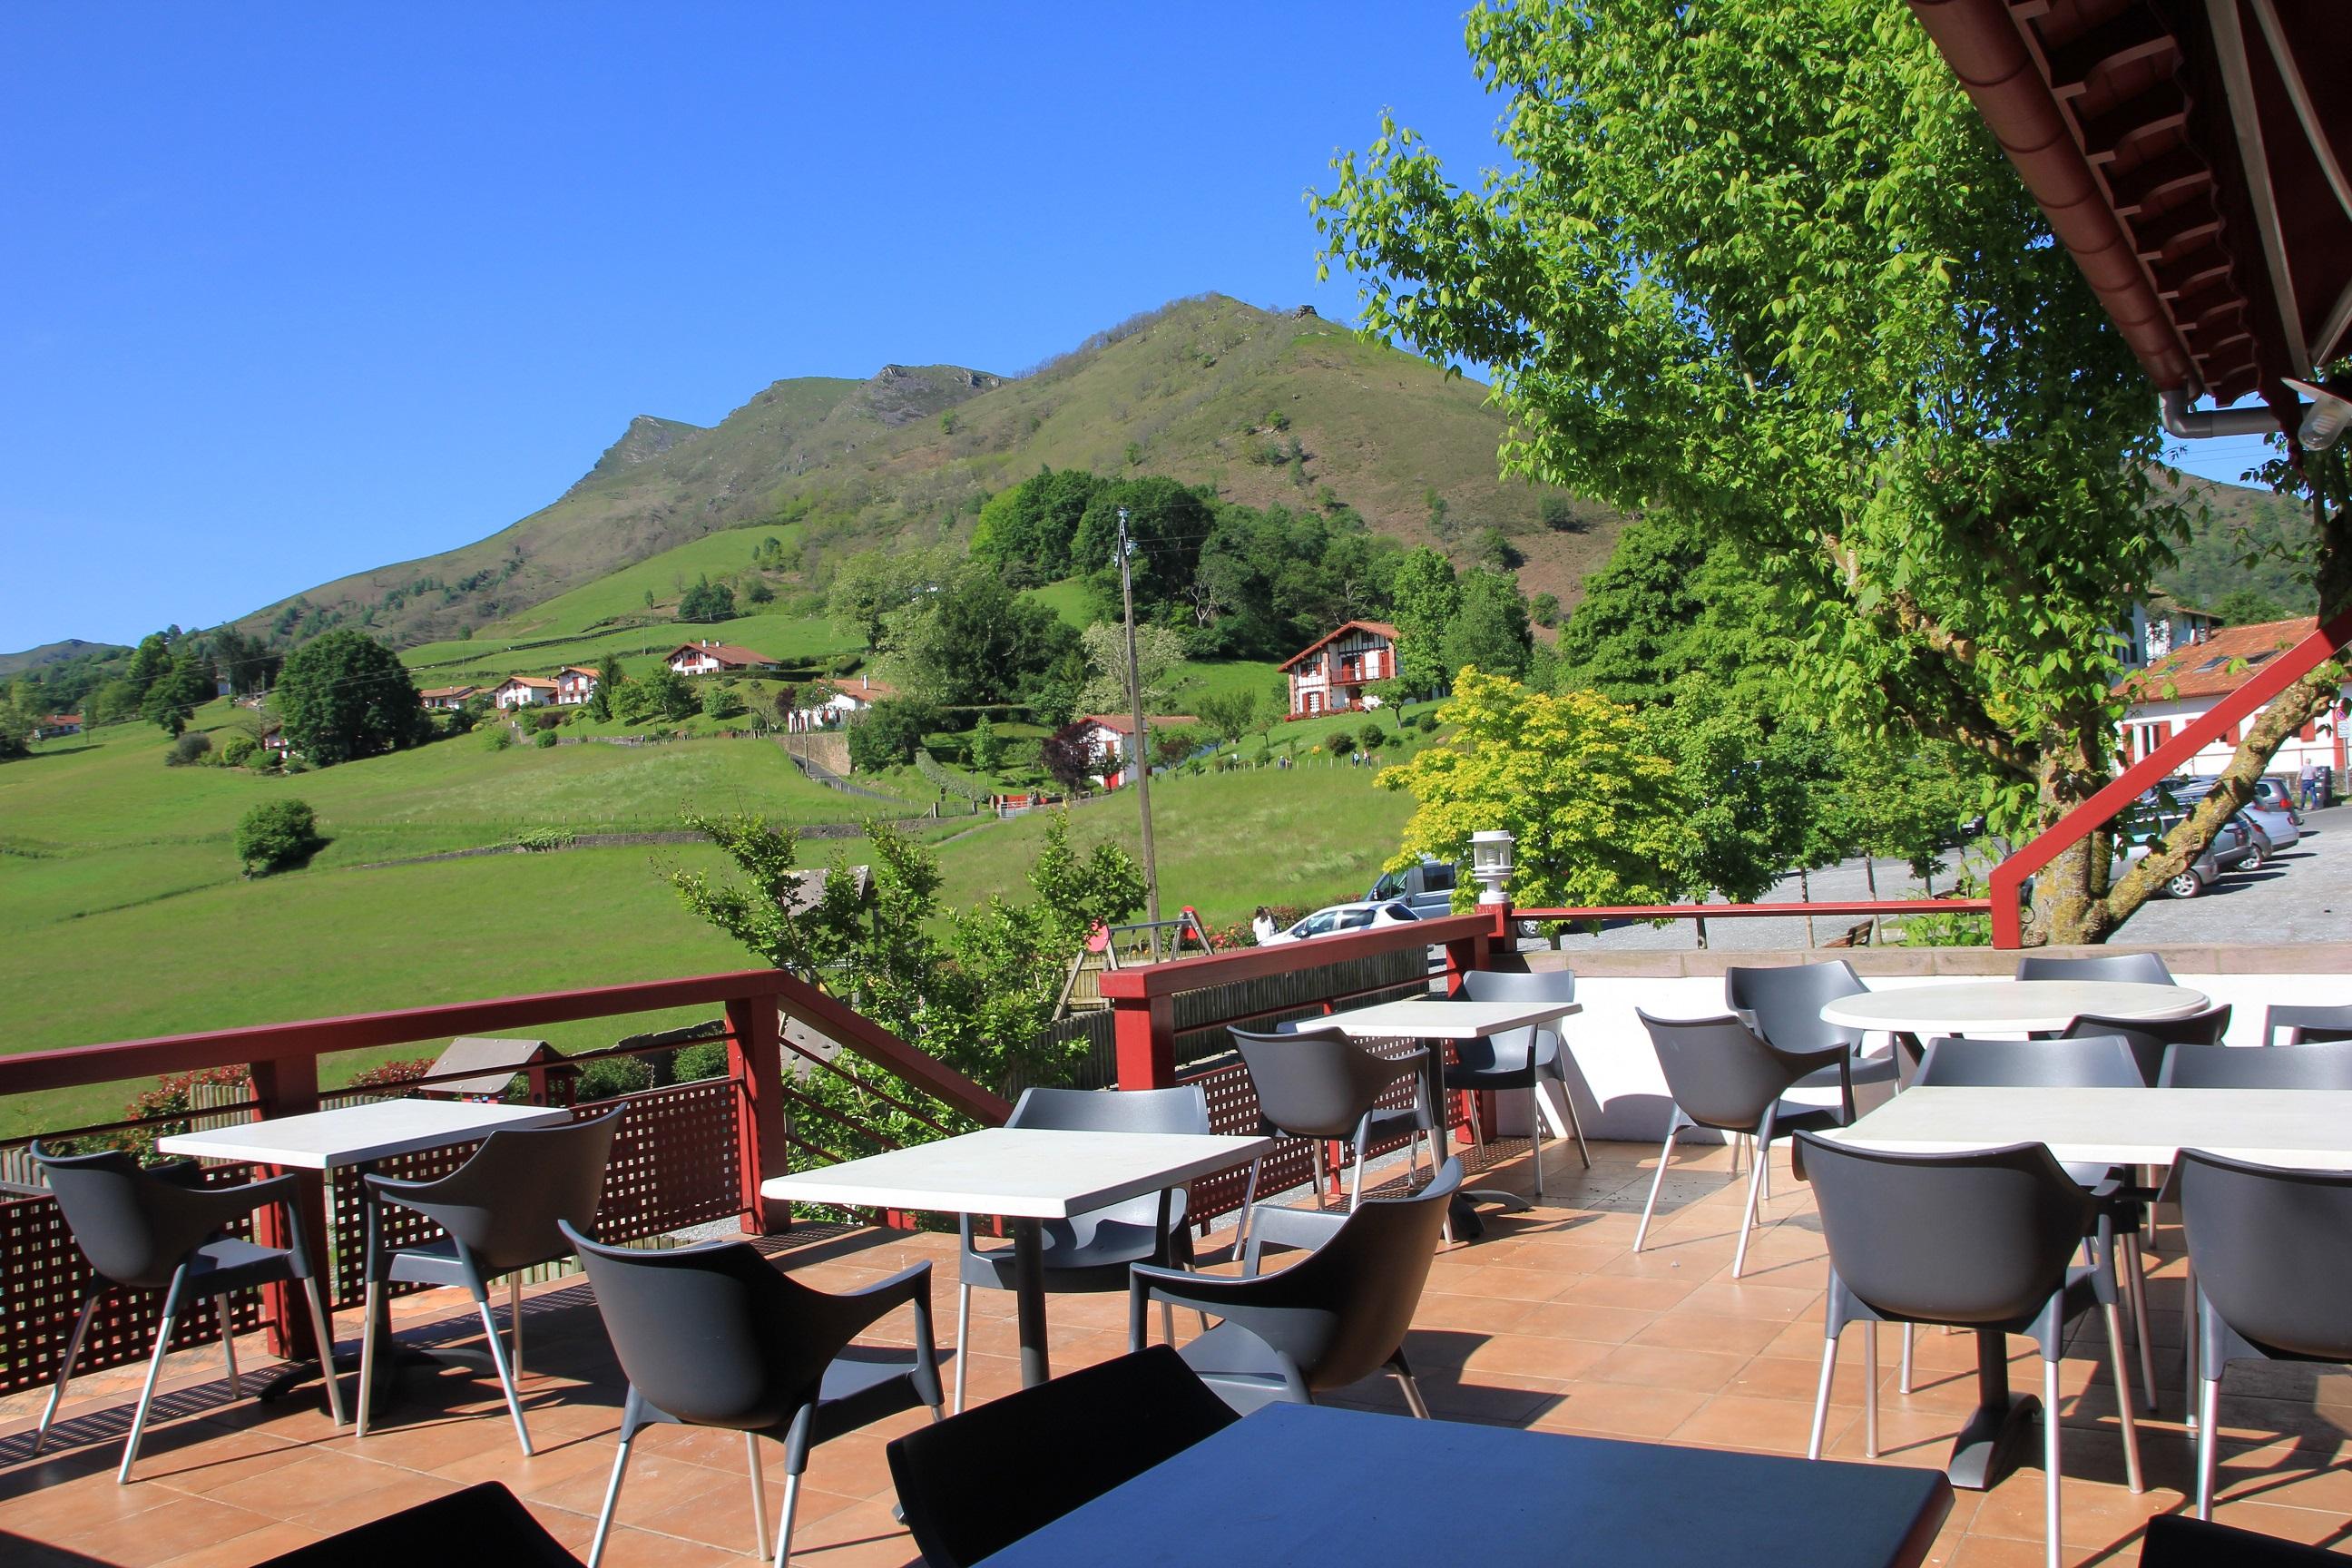 Restaurants Bidarrays la terrasse de l'auberge iparla